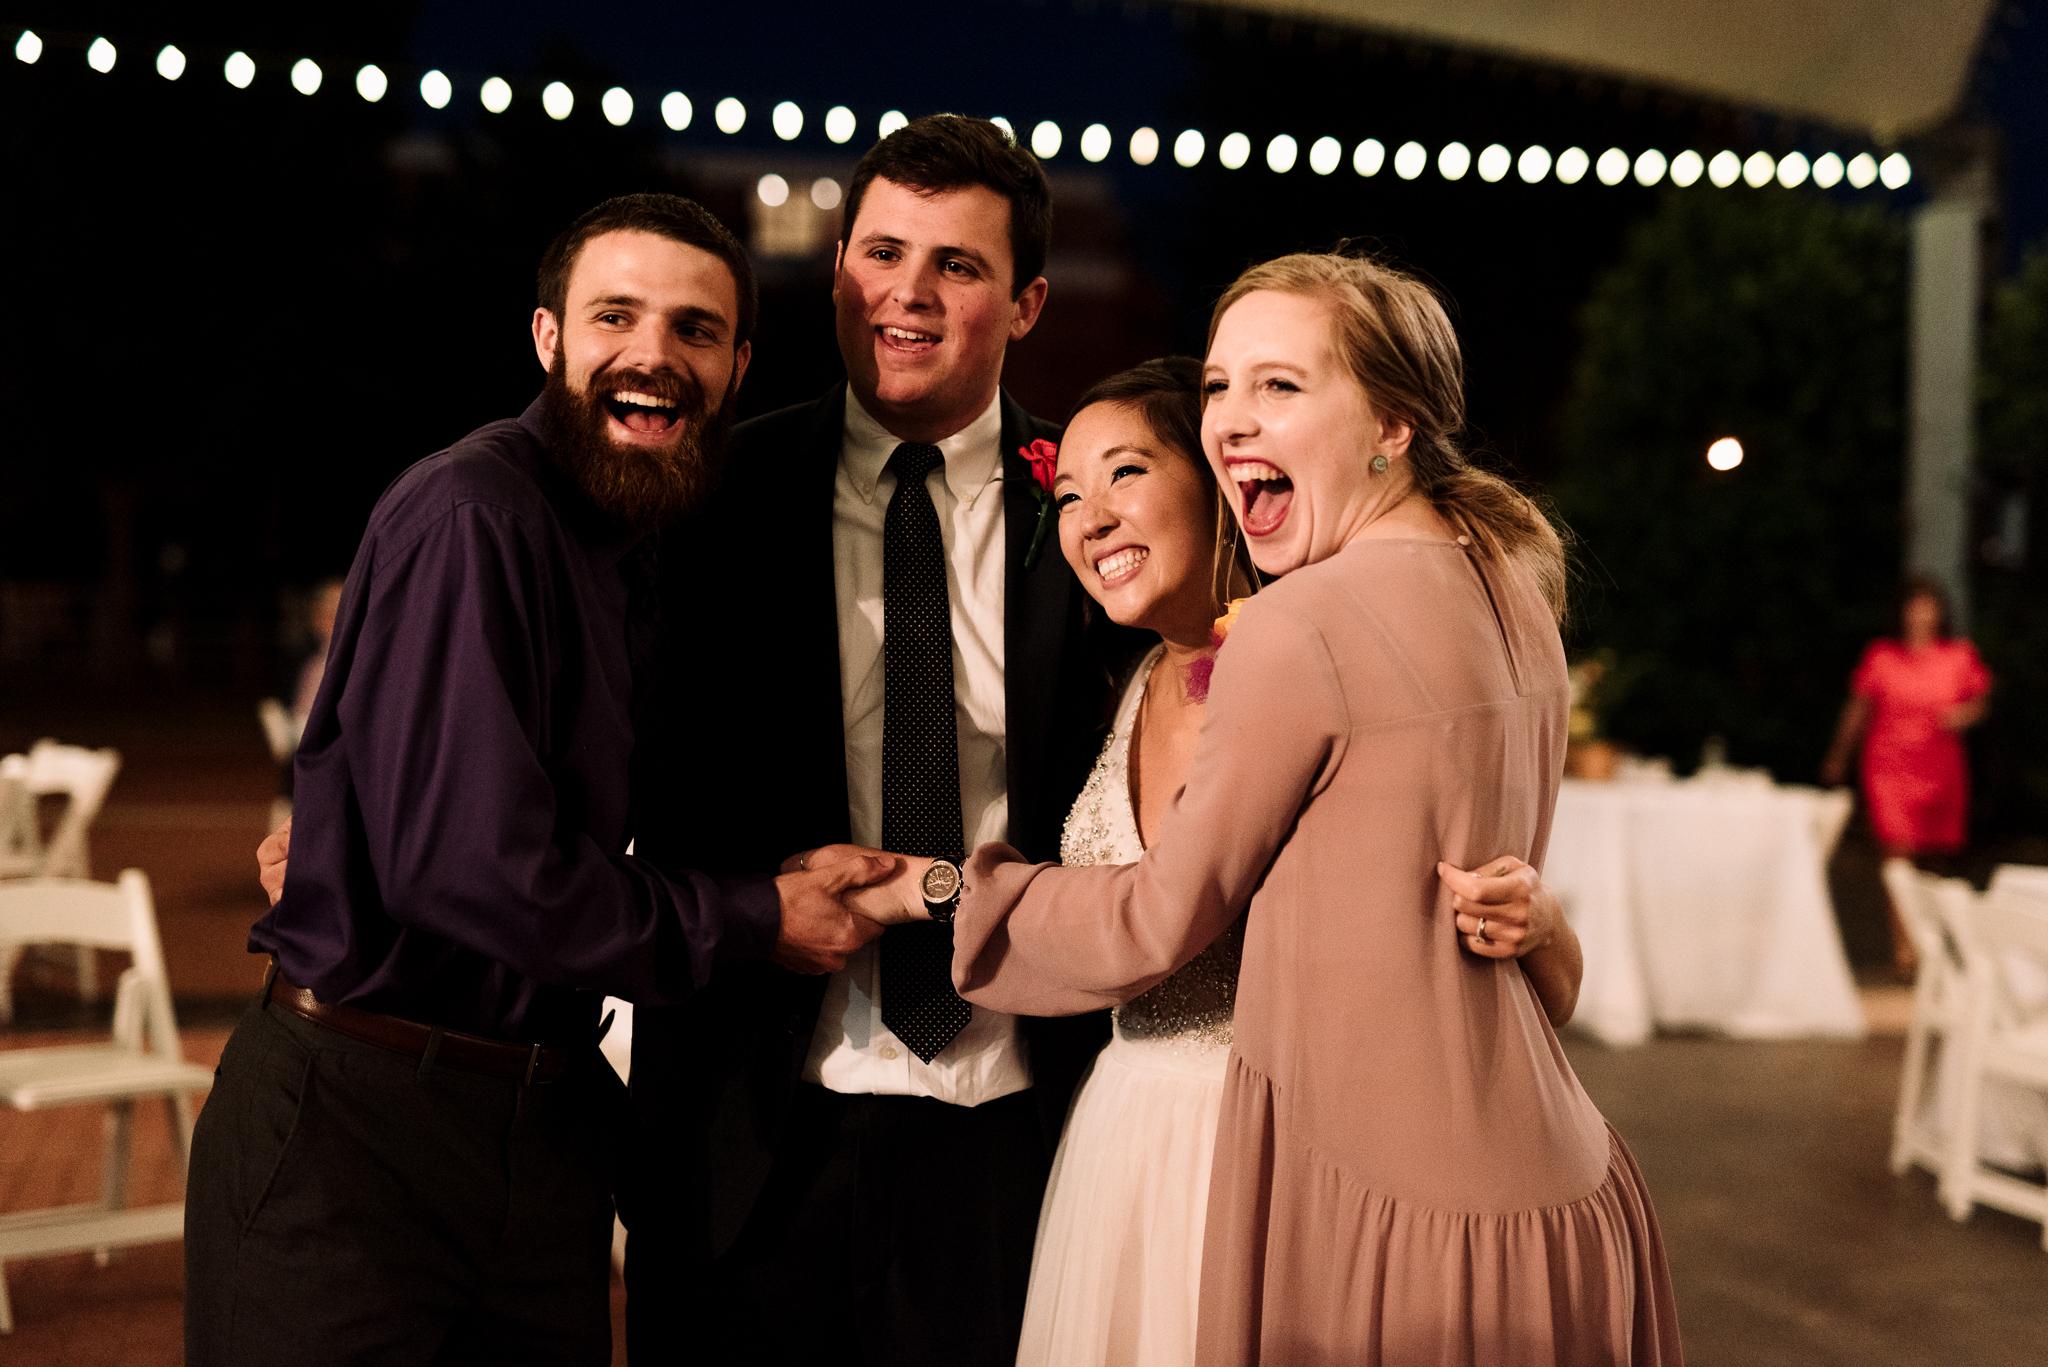 Oklahoma-Christian-University-Wedding-9482.jpg